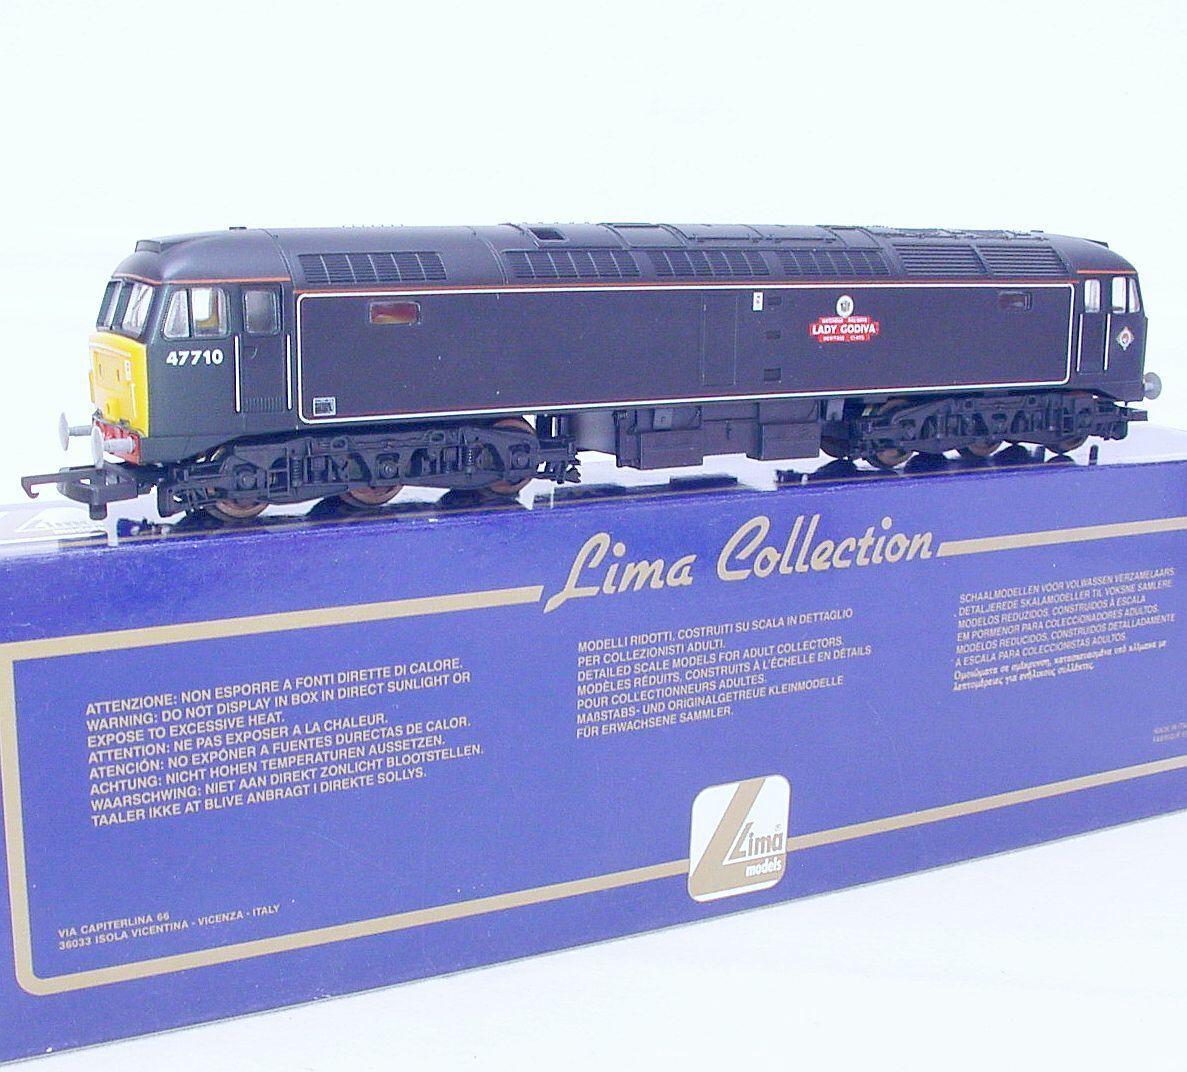 Lima HO OO British WATERMAN RAILWAYS Class 47  LADY GODIVA  LOCOMOTIVE MIB`90